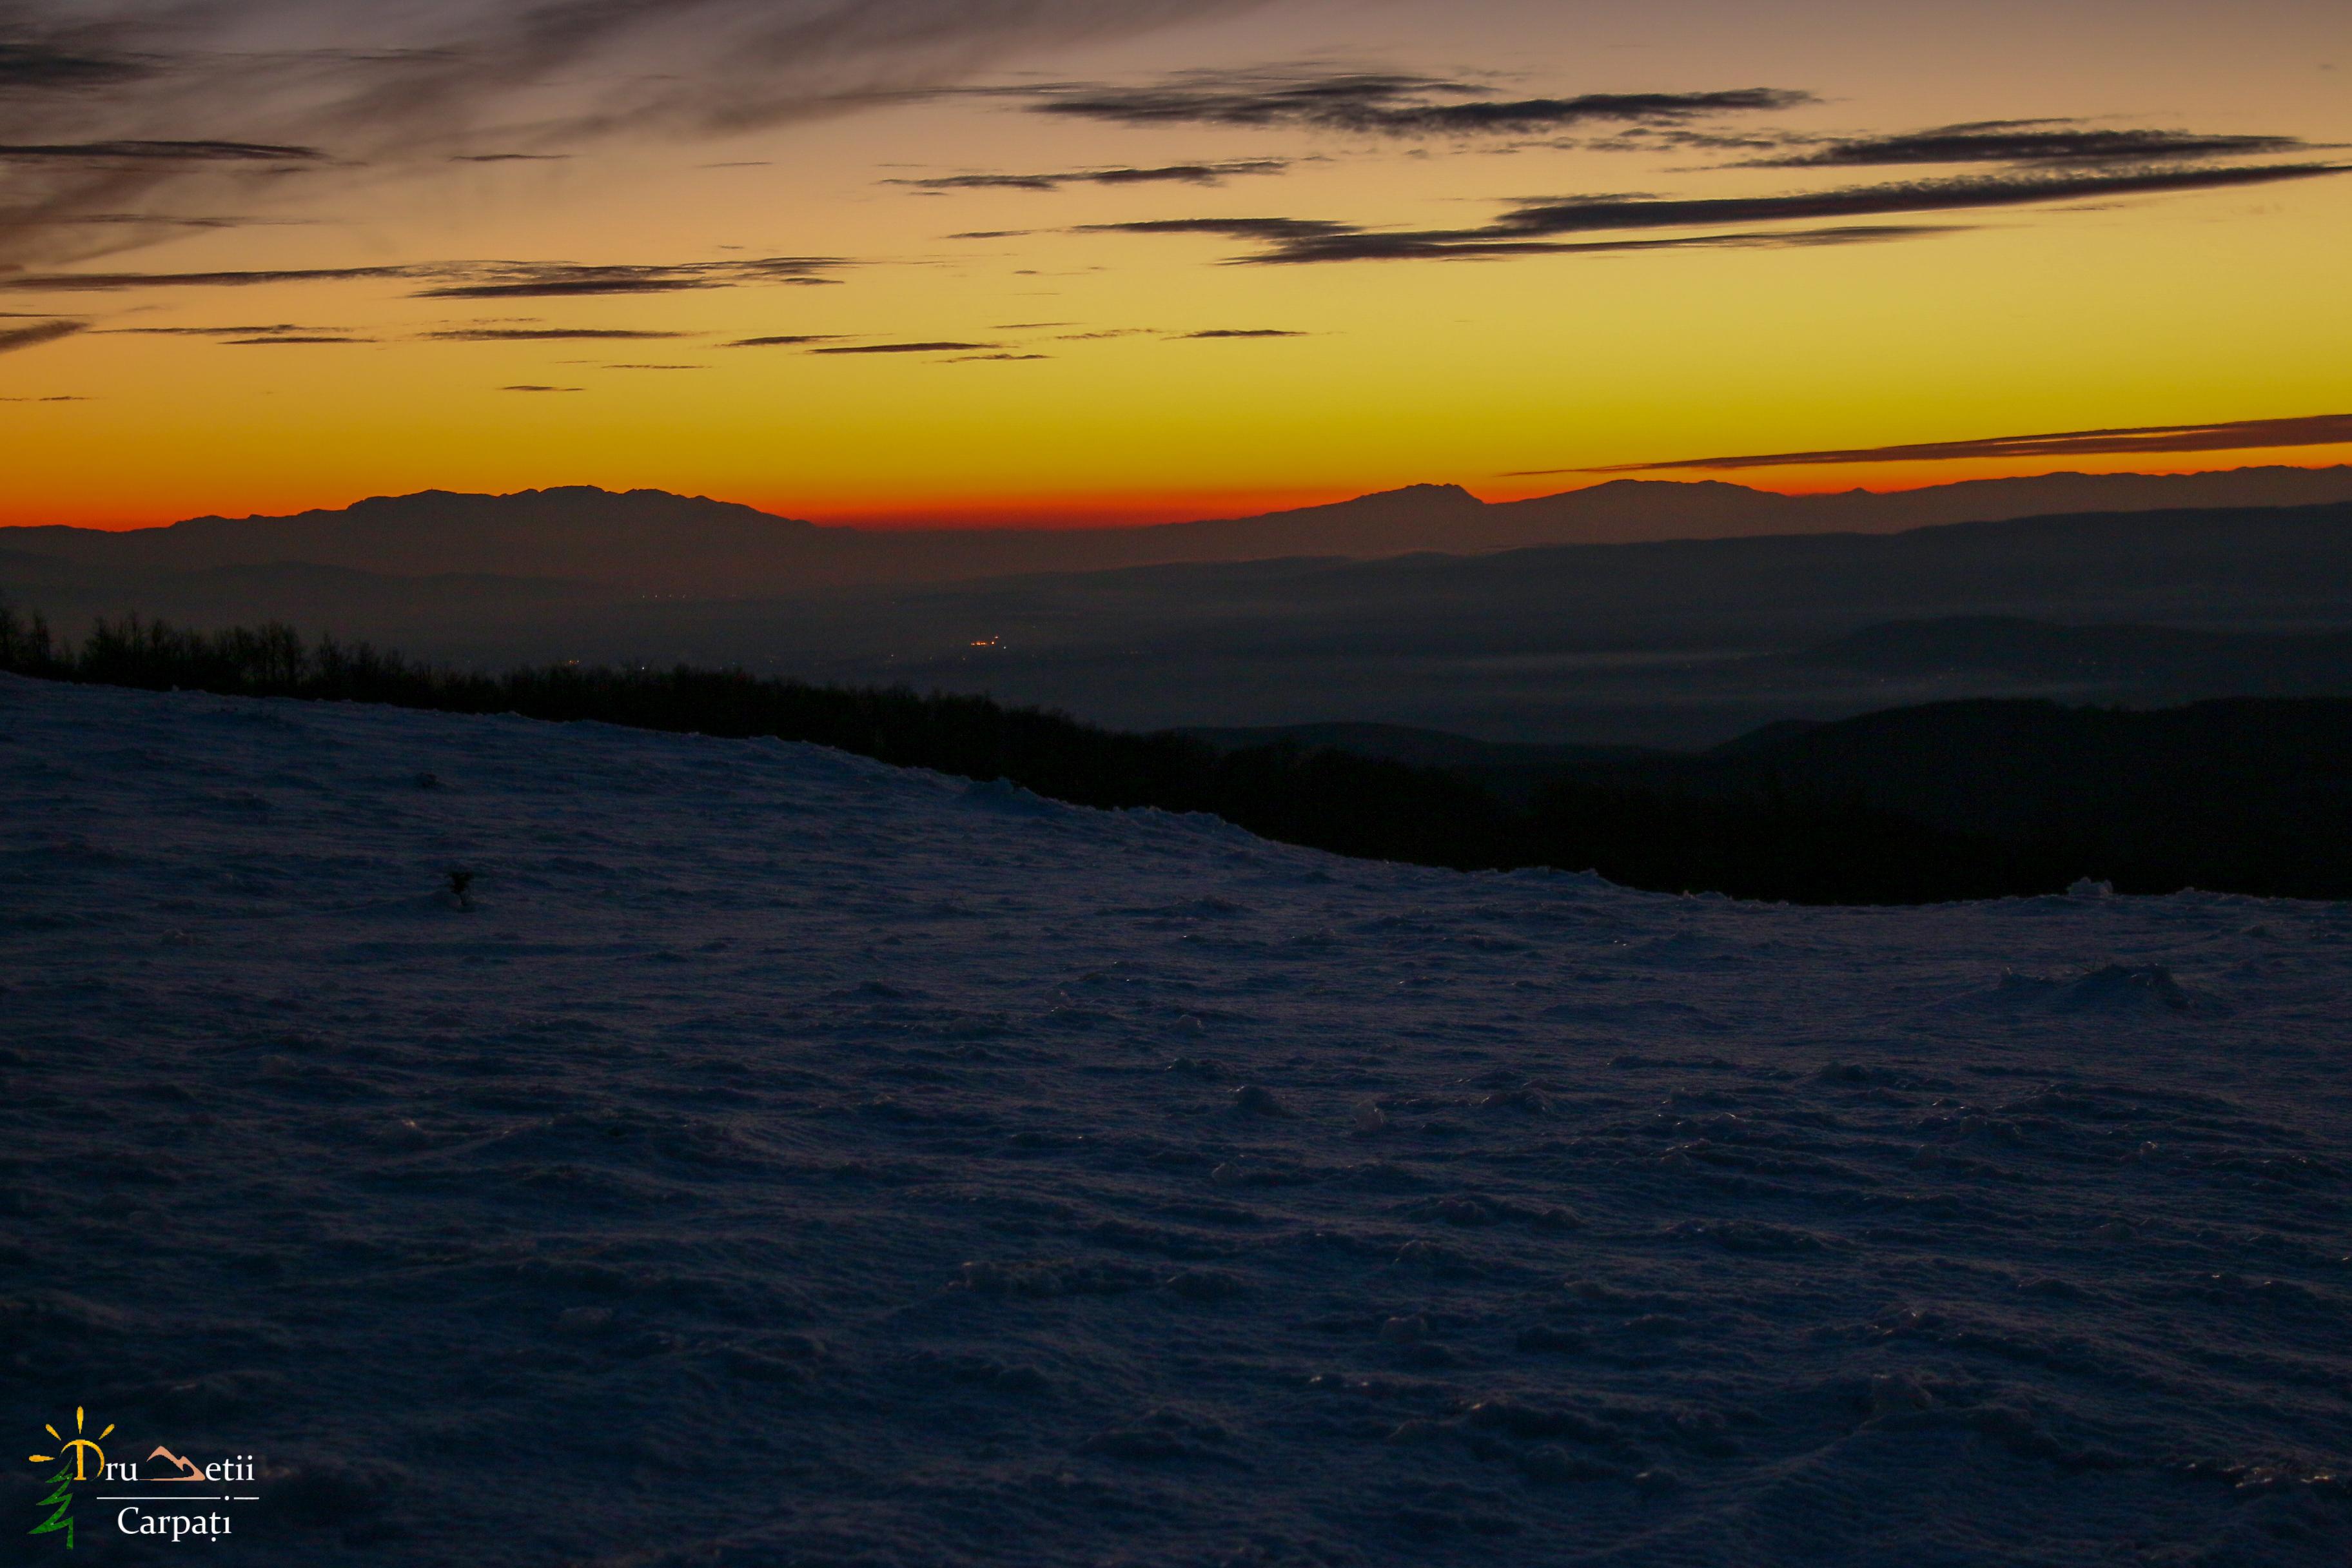 Bodoc - înc-un munte, te provoc! @ Munții Bodocului